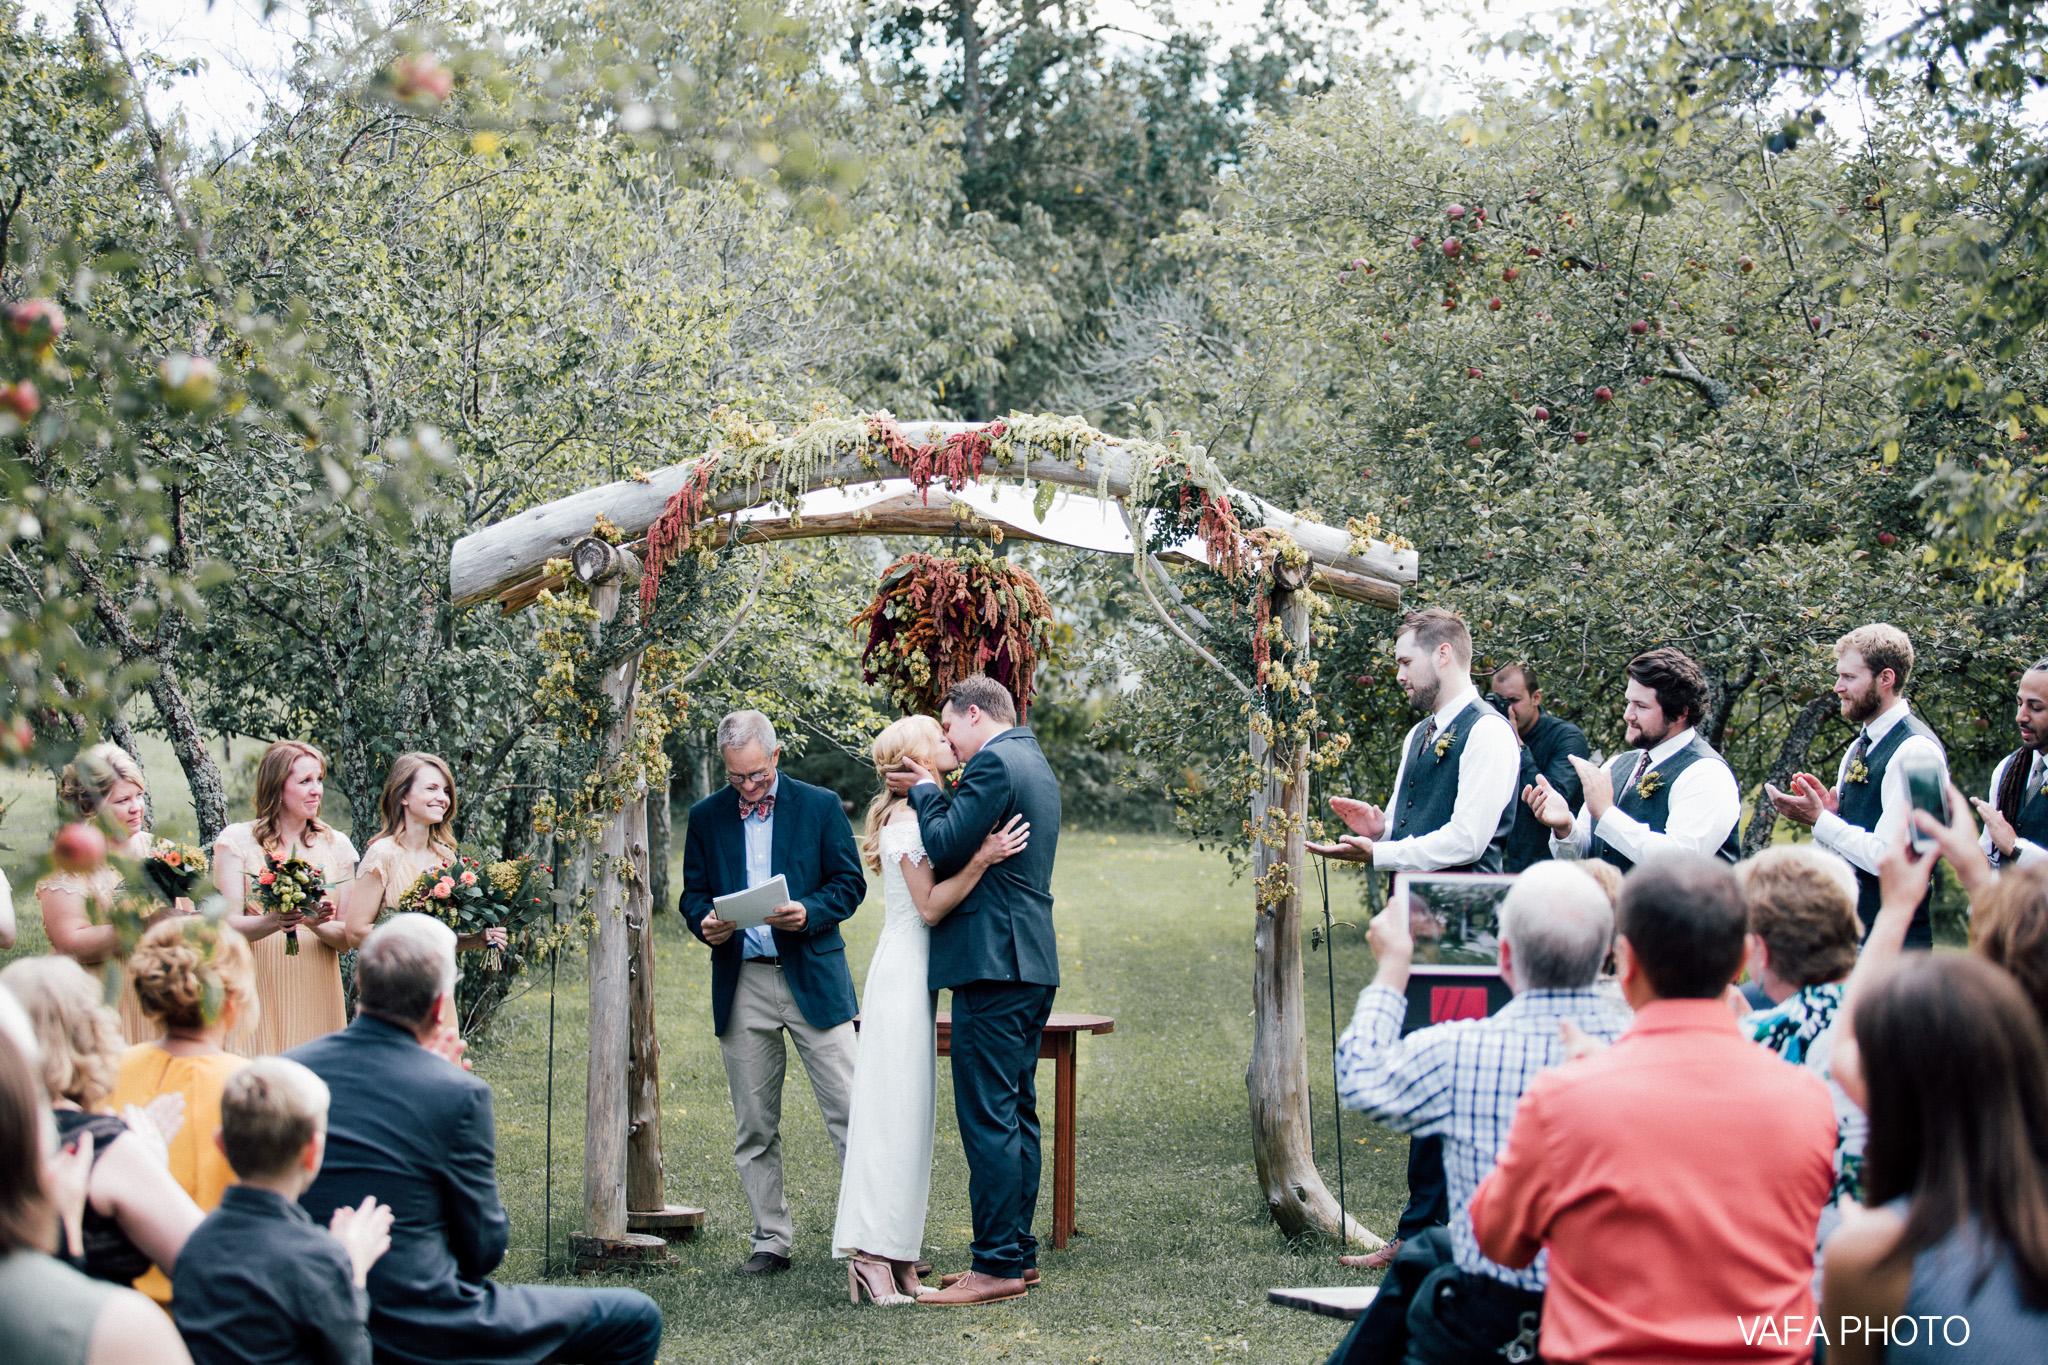 Belsolda-Farm-Wedding-Christy-Eric-Vafa-Photo-491.jpg